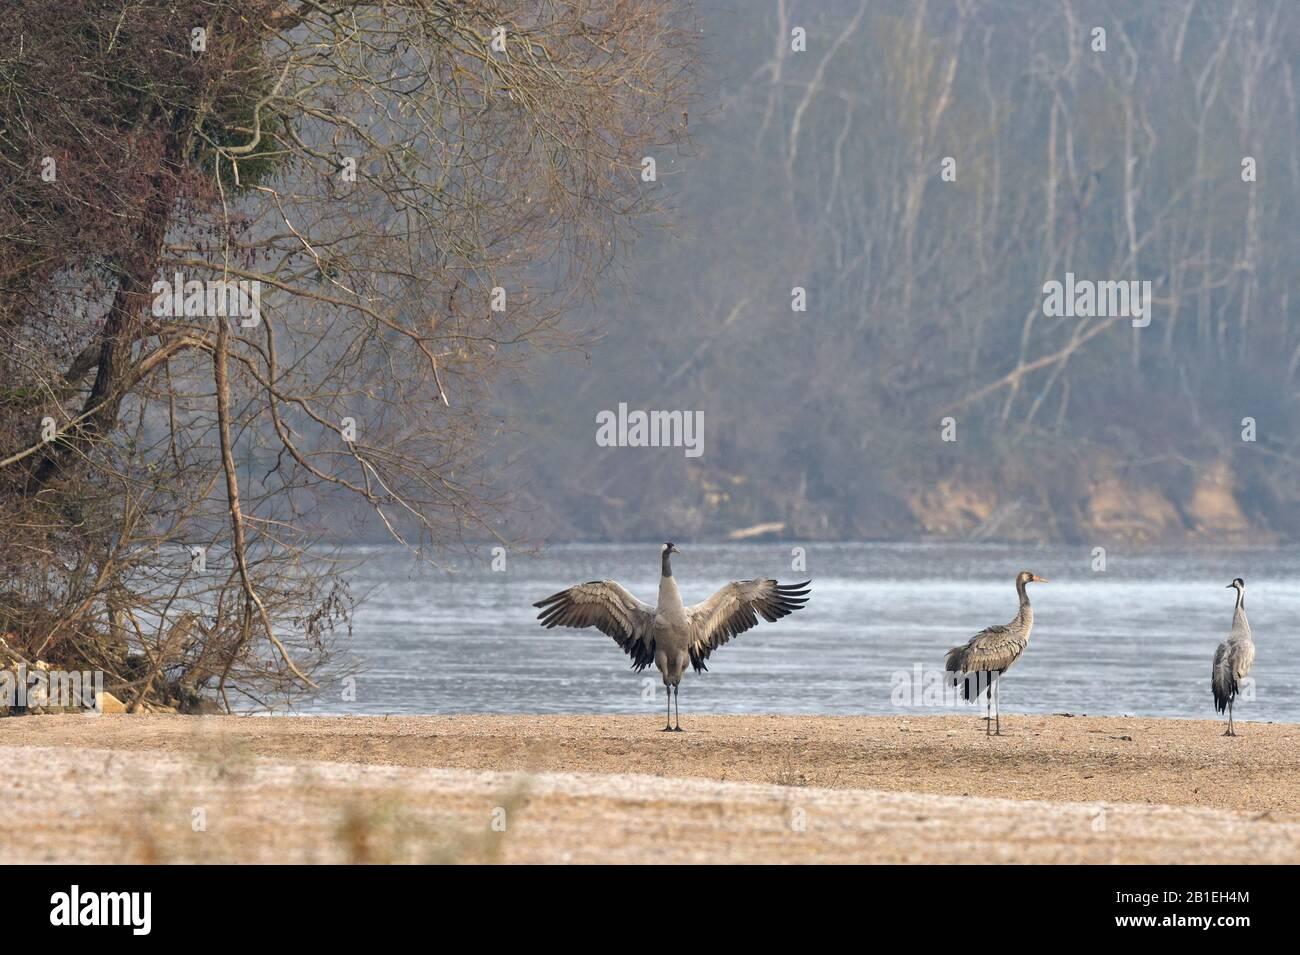 Common Crane (Grus grus) stretching on a sandbar of the Loire, France Stock Photo